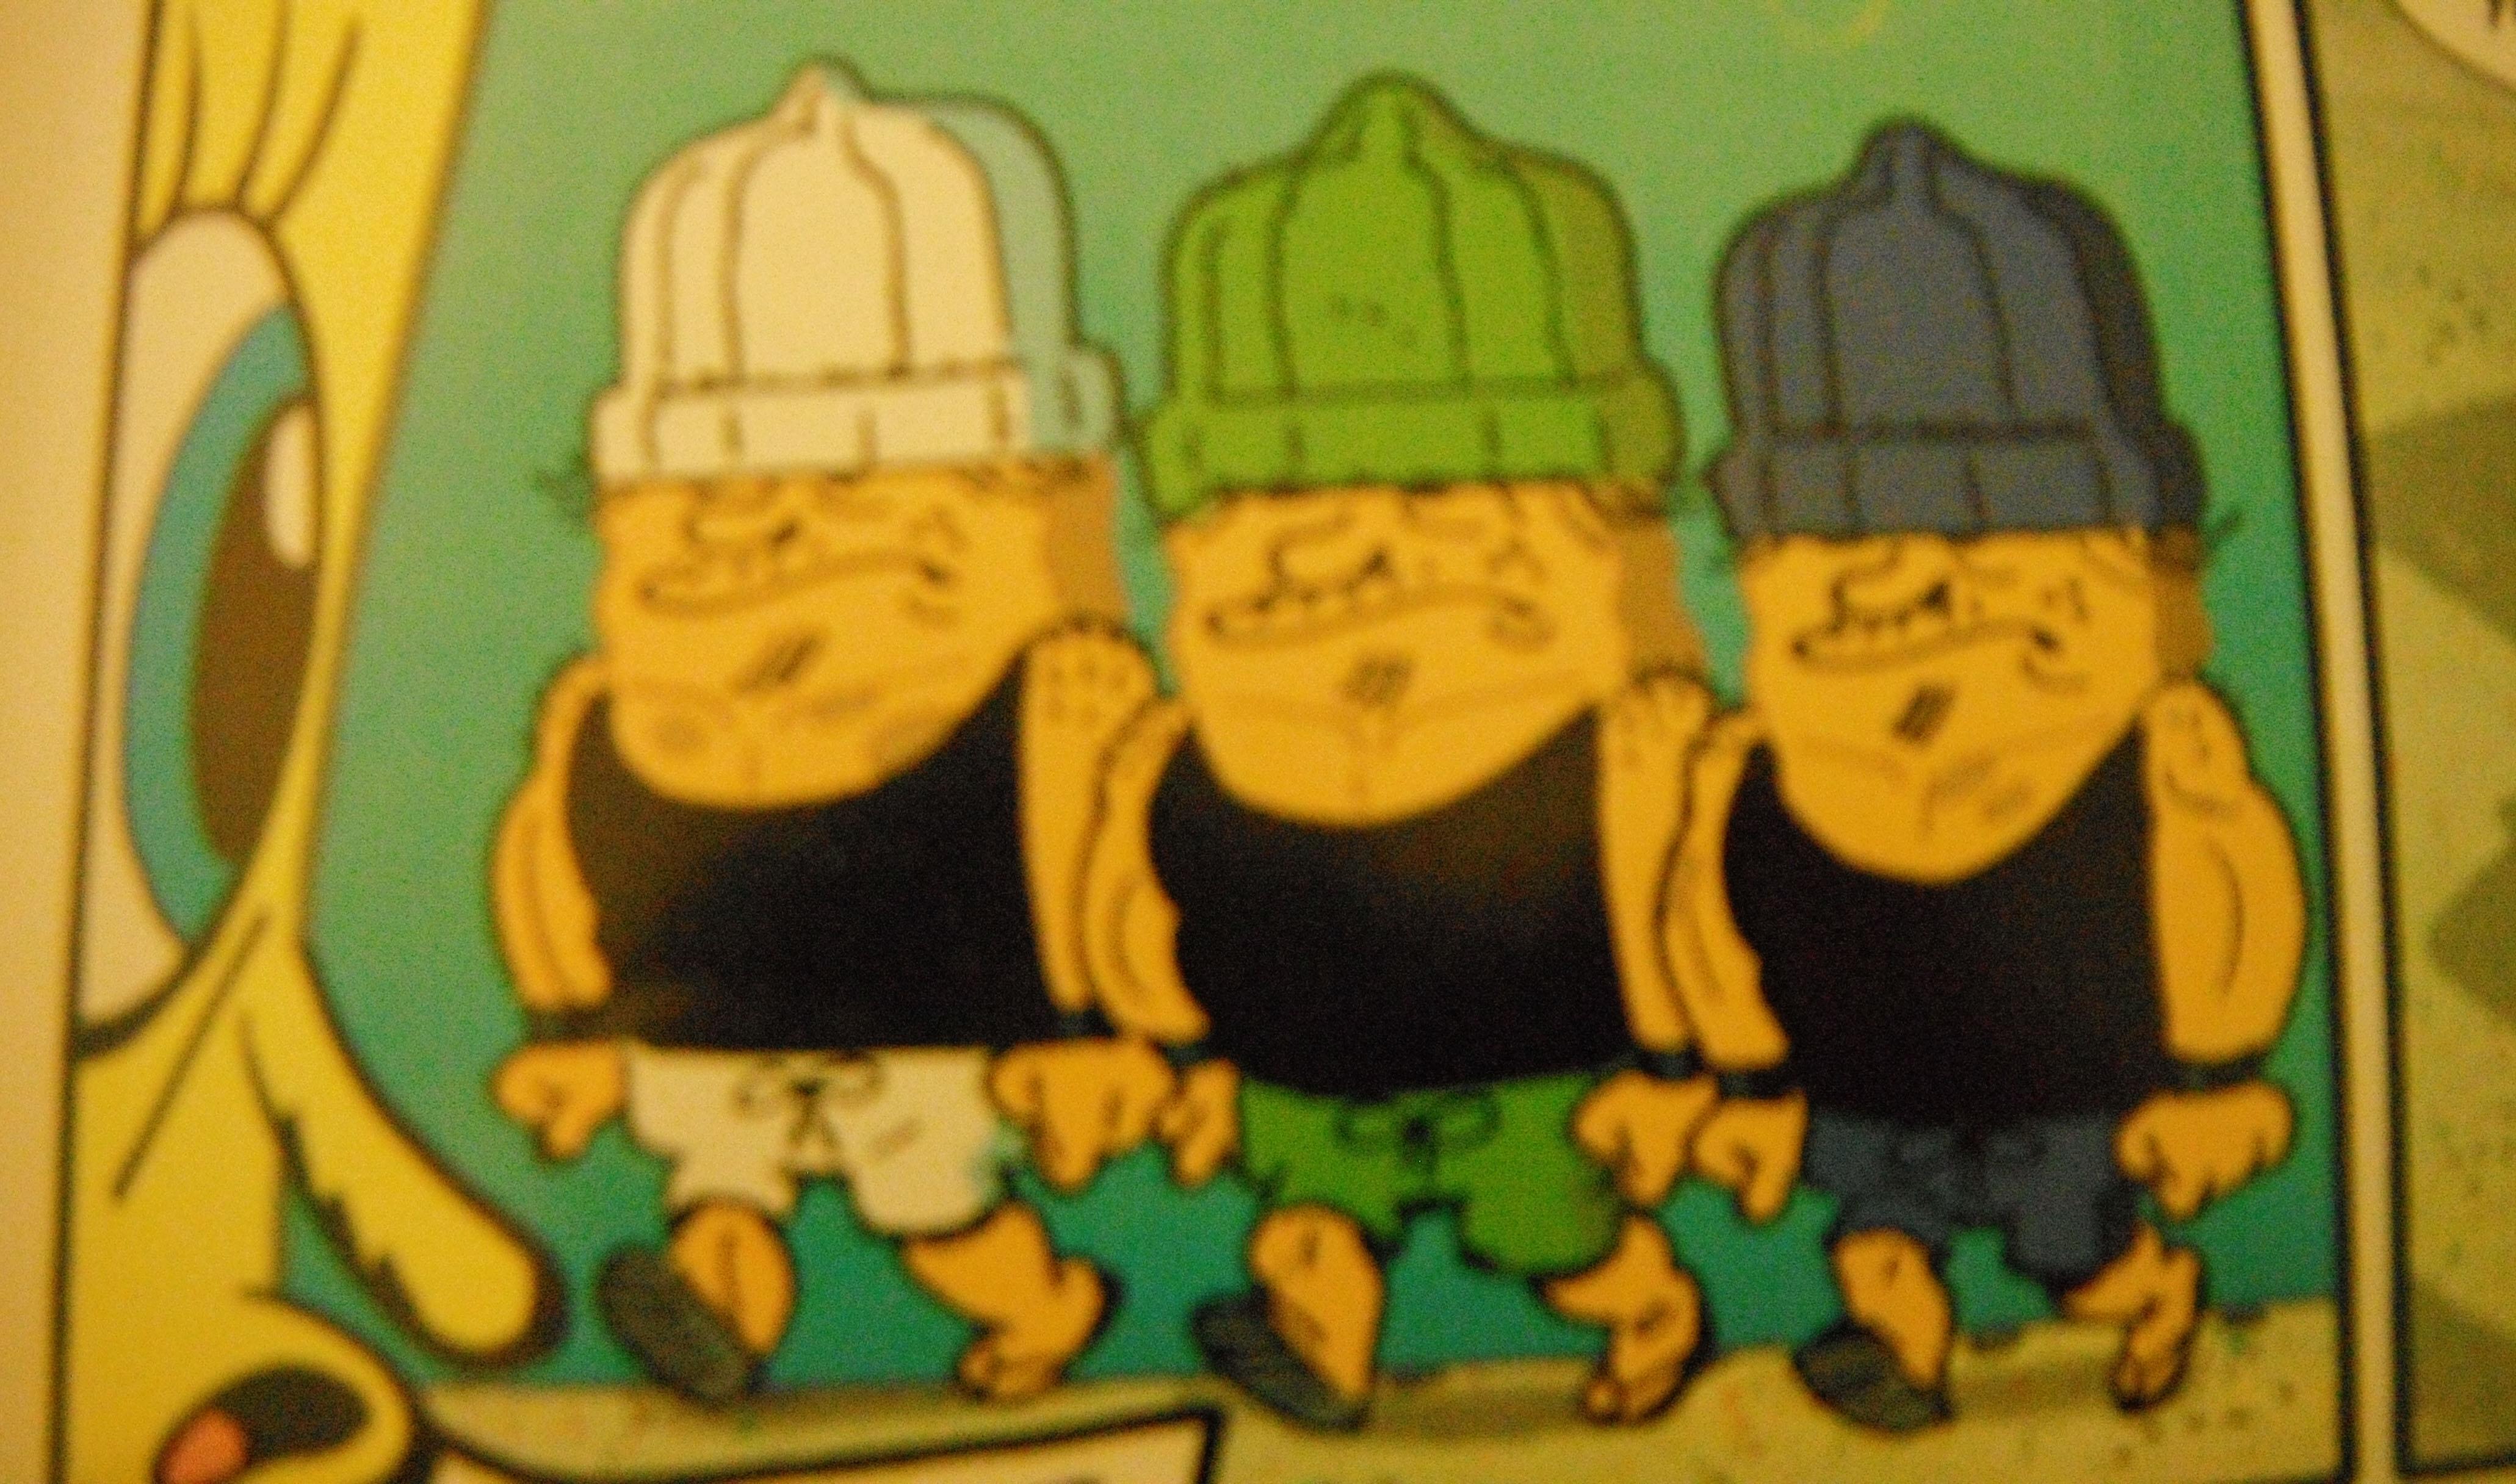 File:SpongeBrian-SpongeKevin-SpongeCarl.jpg